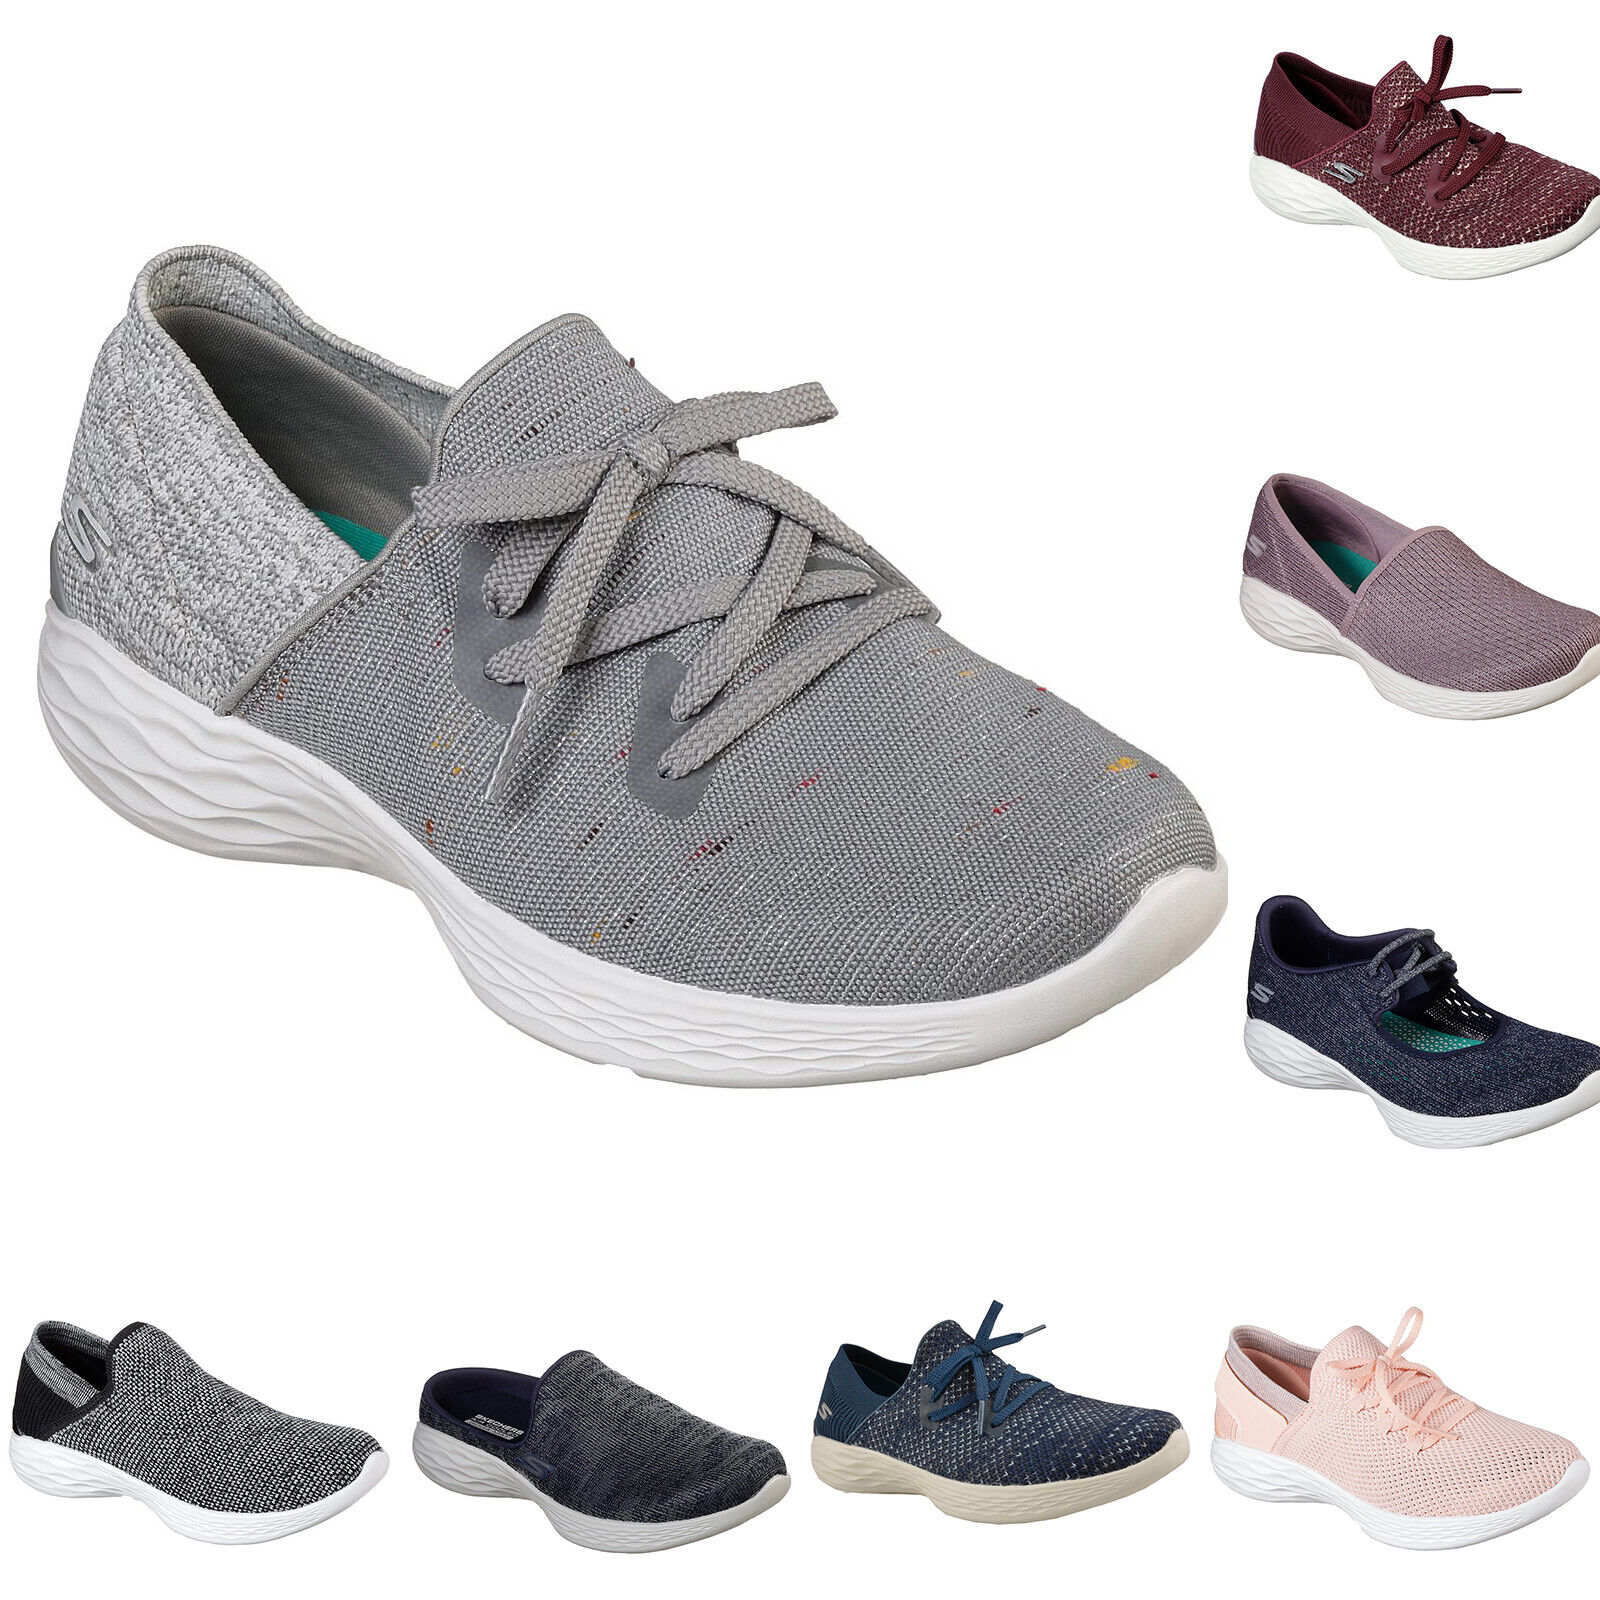 NEU SKECHERS YOU Damen Sneakers Turnschuhe Freizeitschuhe Sport Walking Leicht